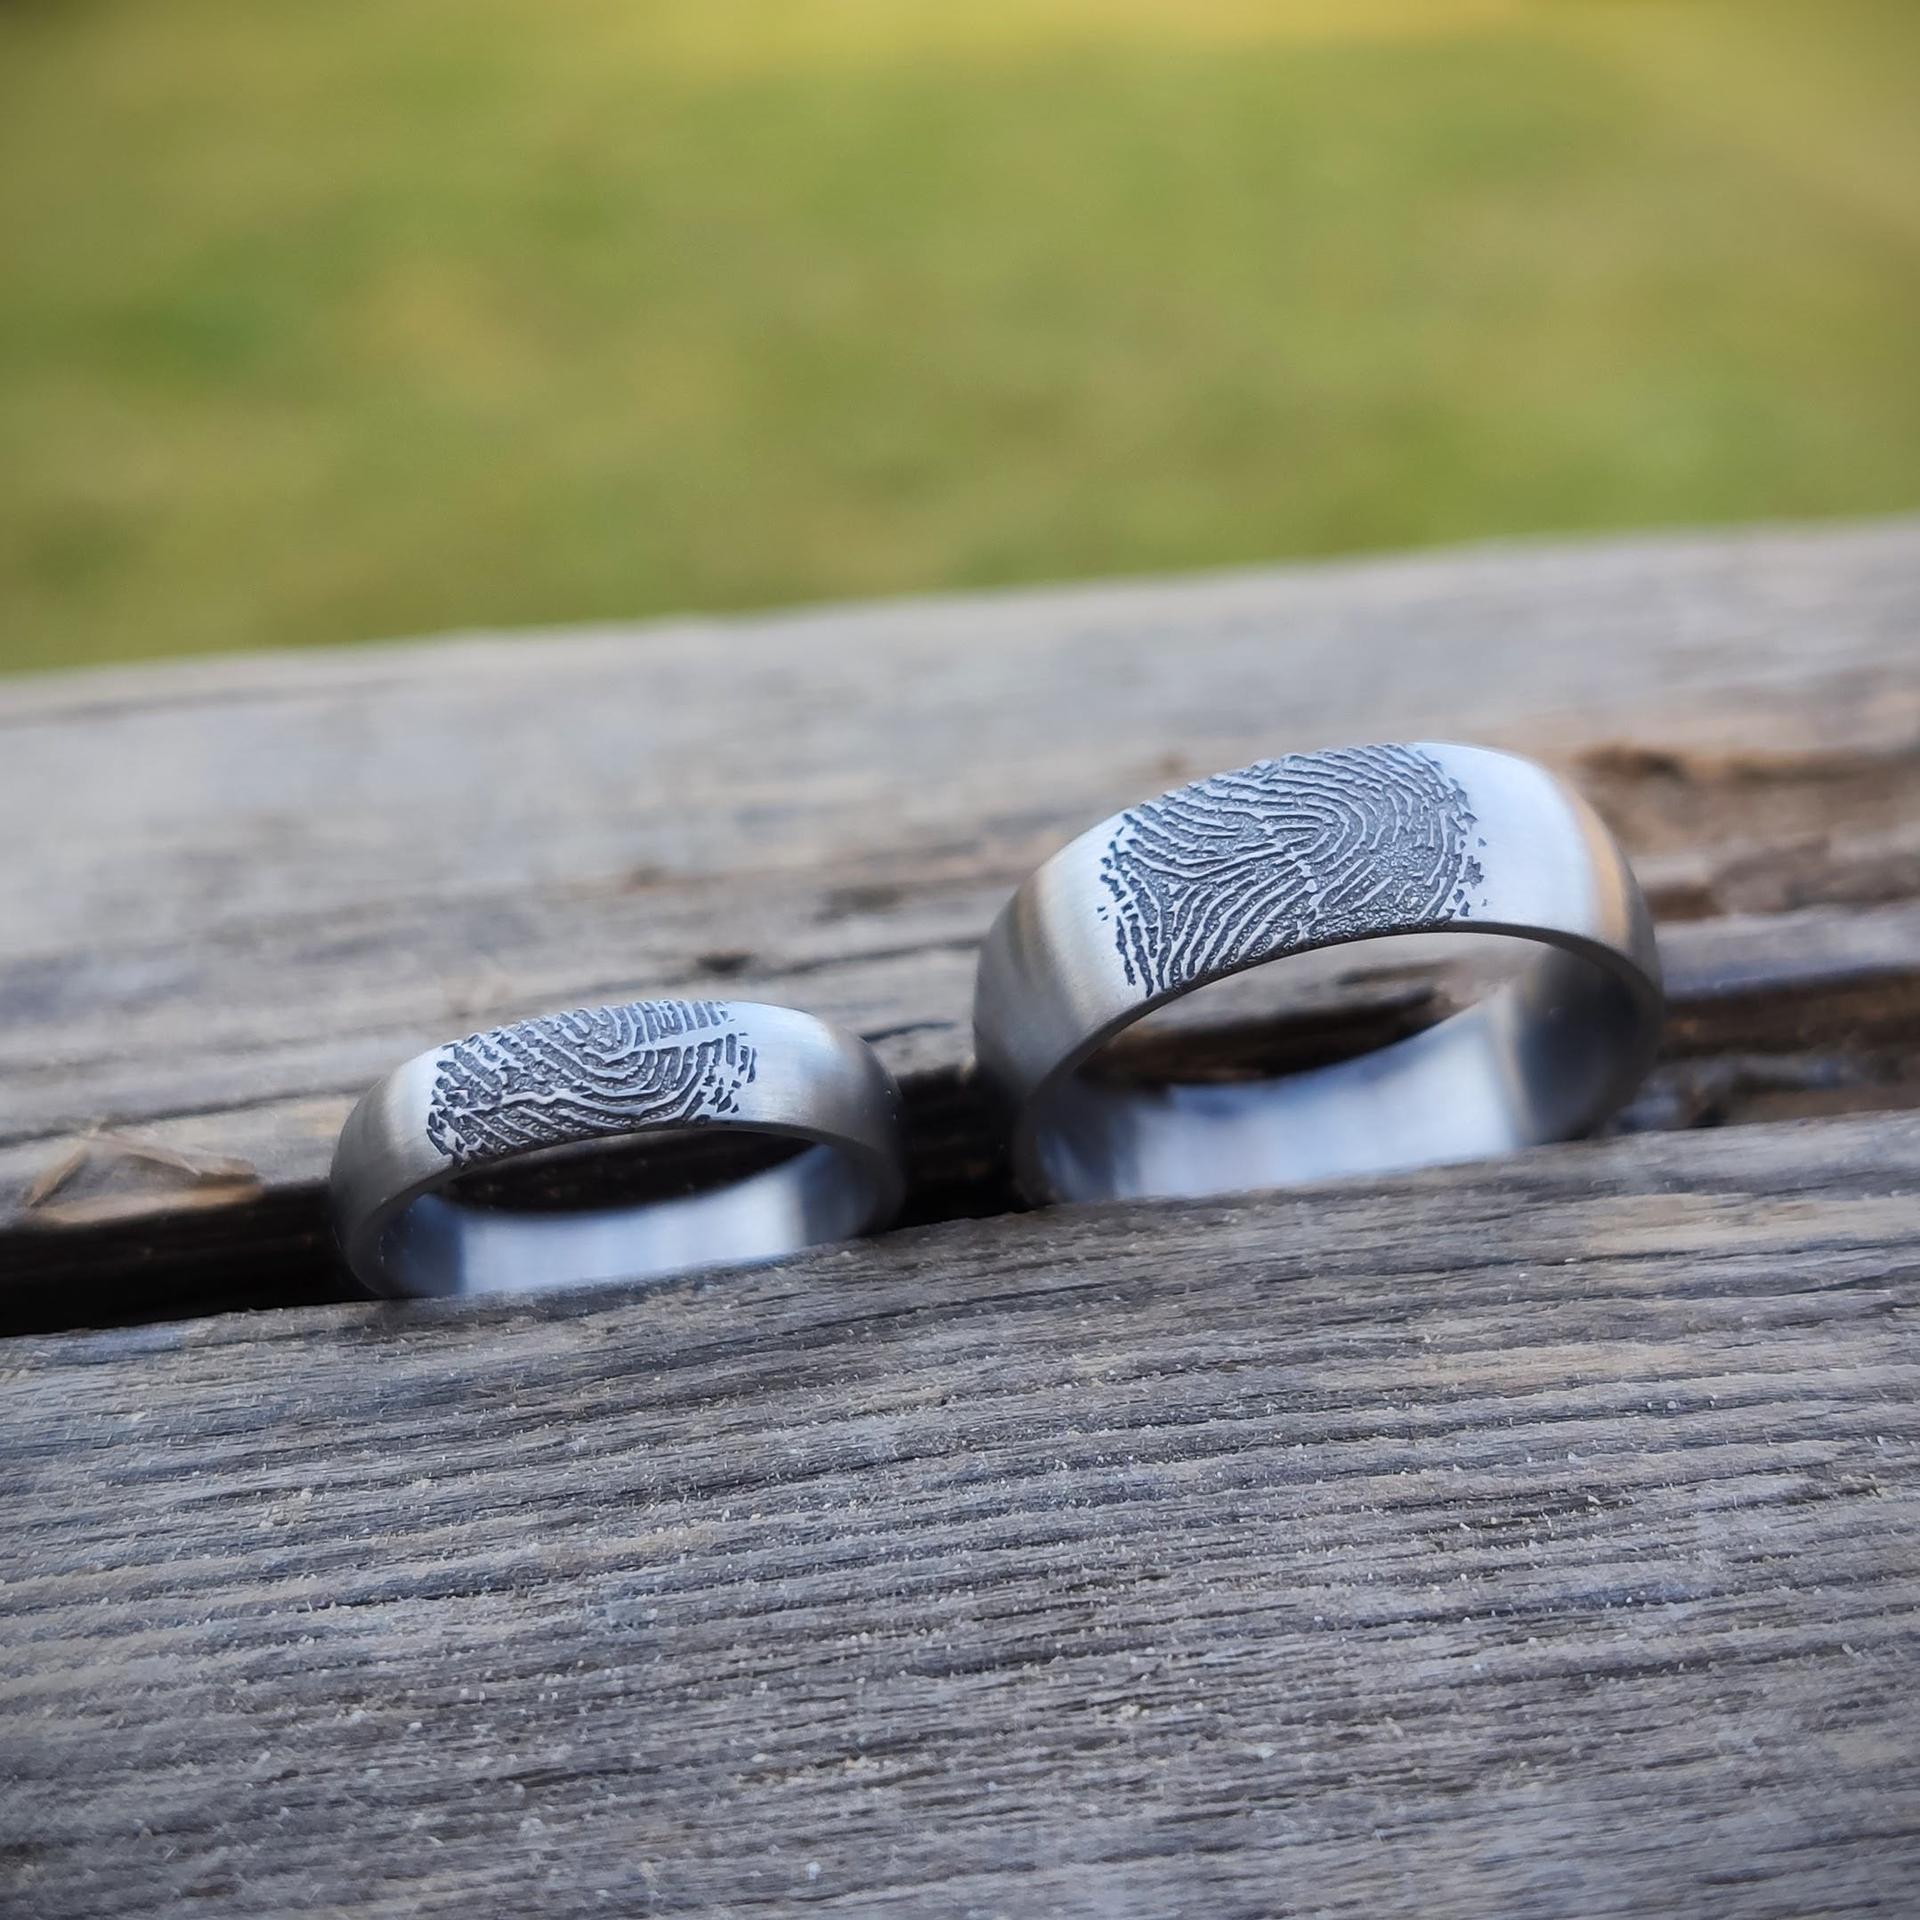 daloo - https://daloo.cz/snubni-prsteny/snubni-prsteny-individual.html